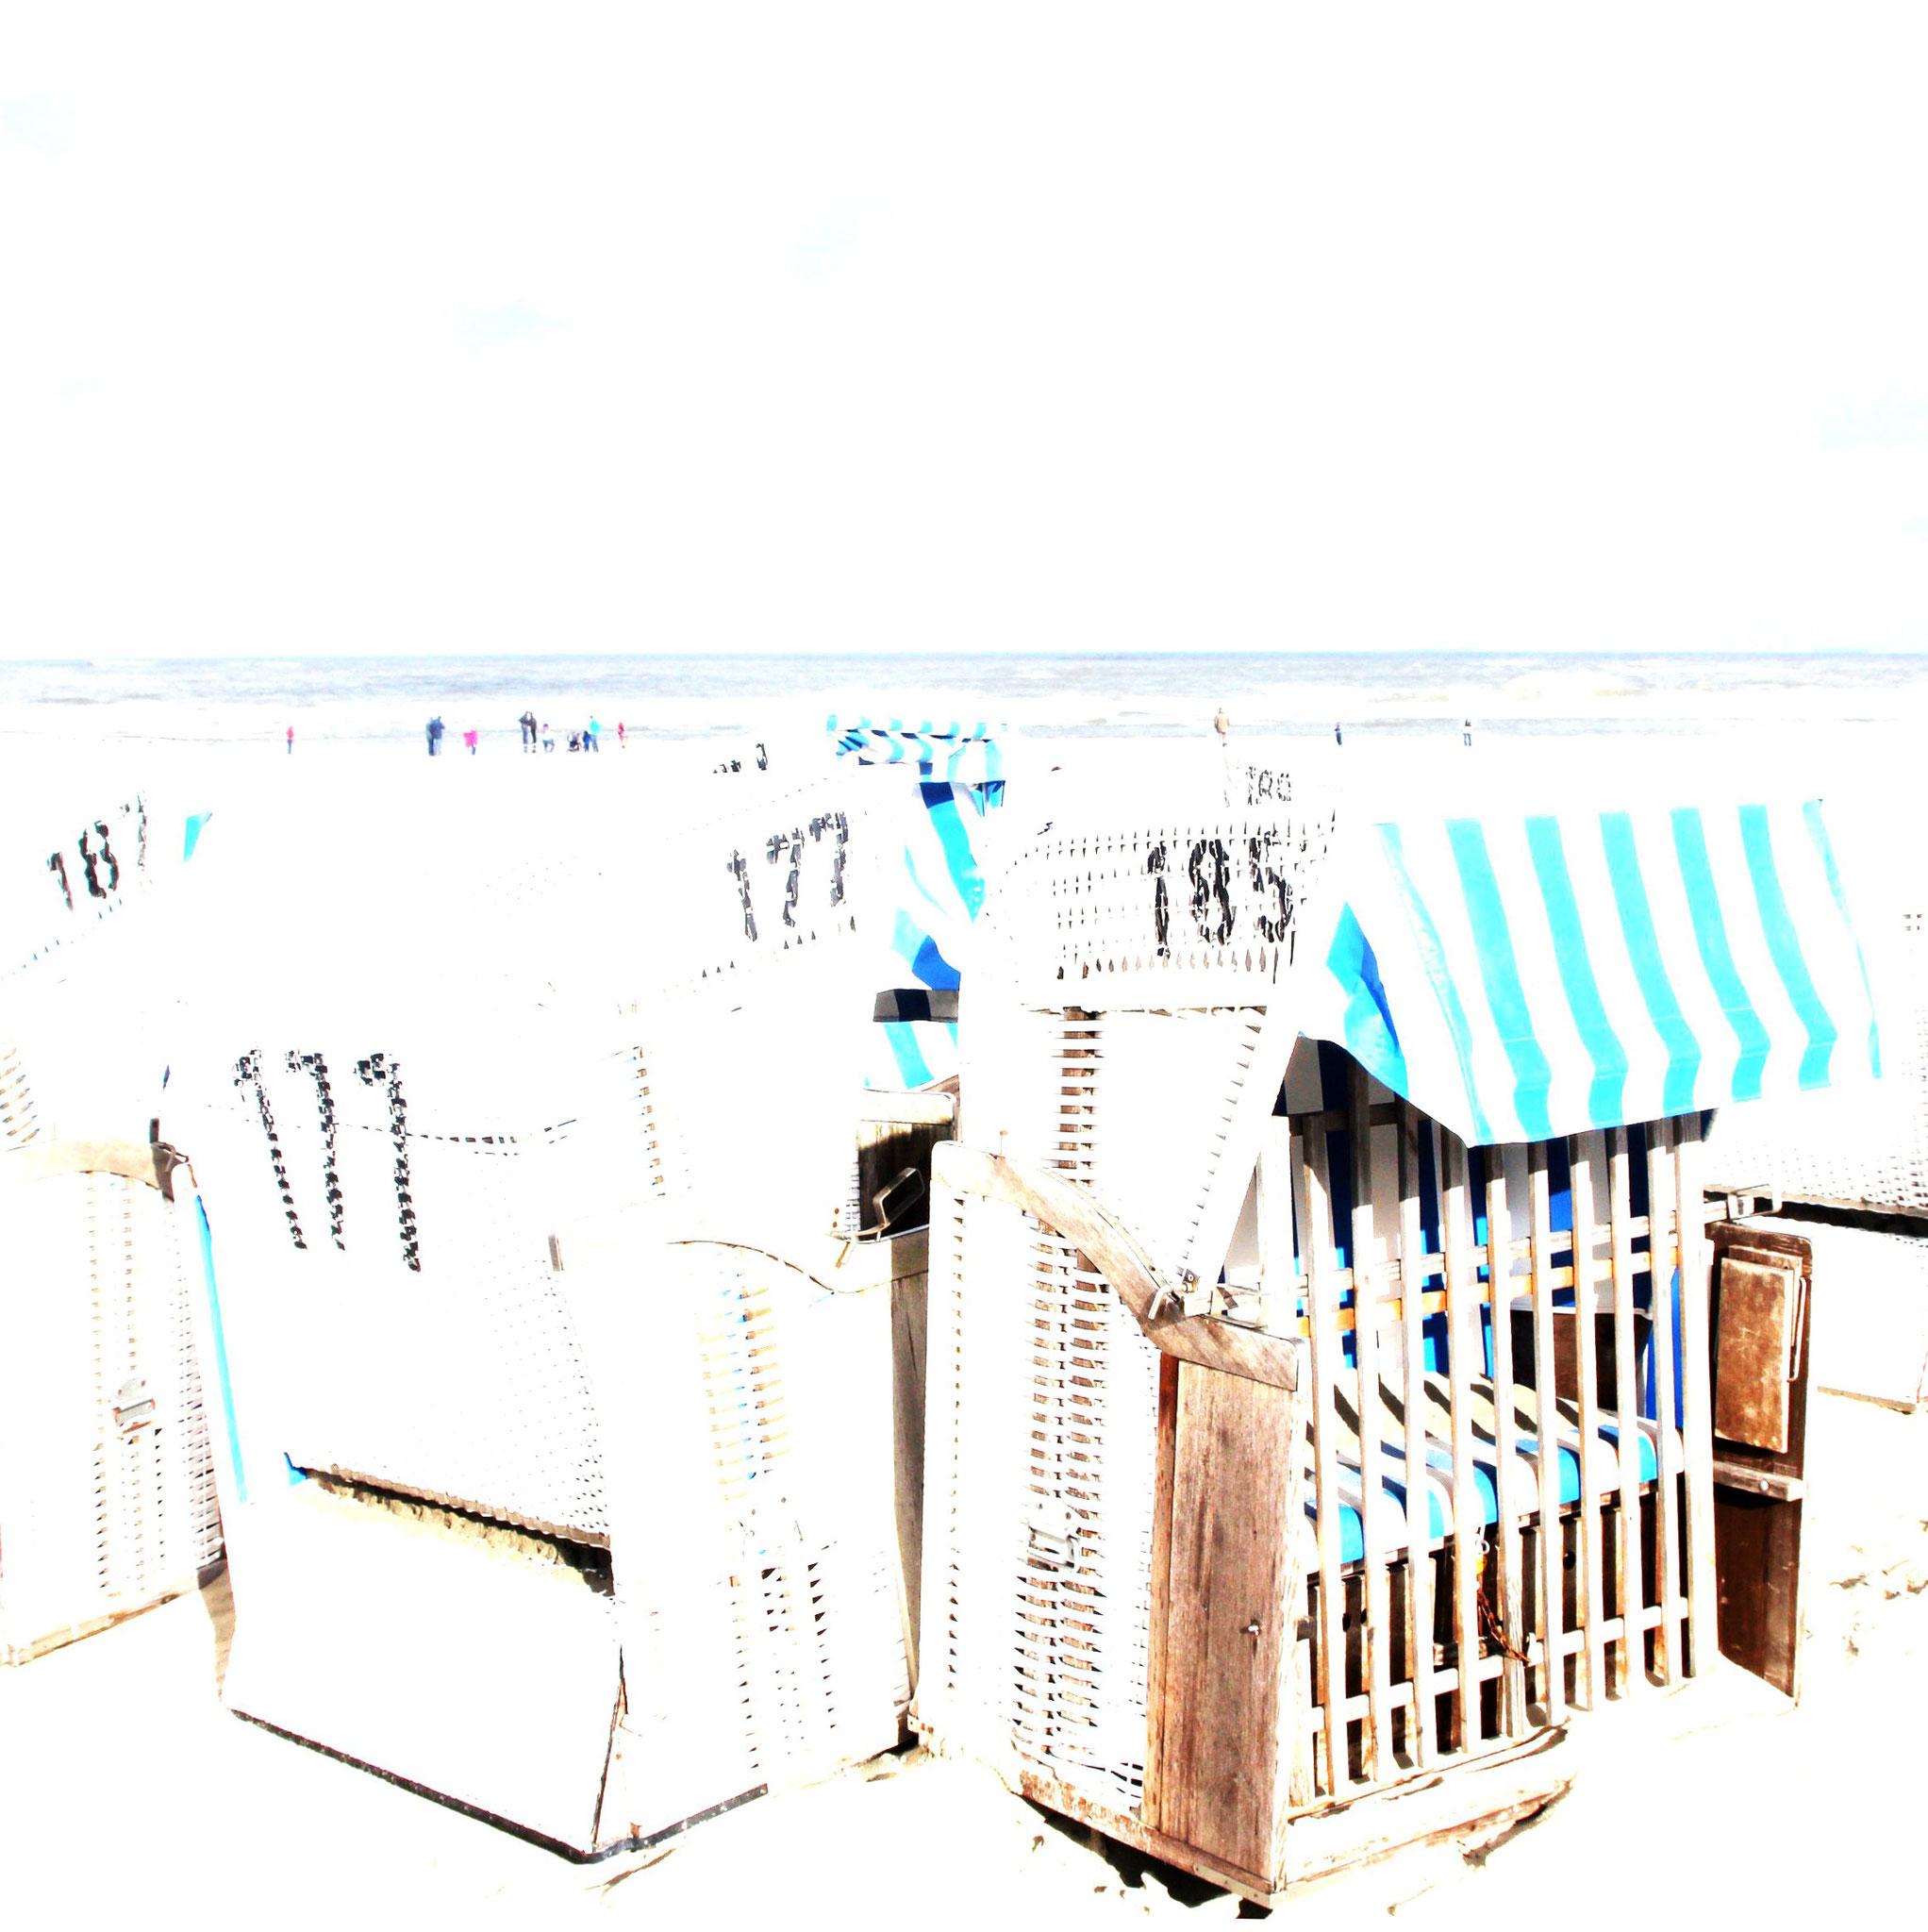 177[185] Nordsee